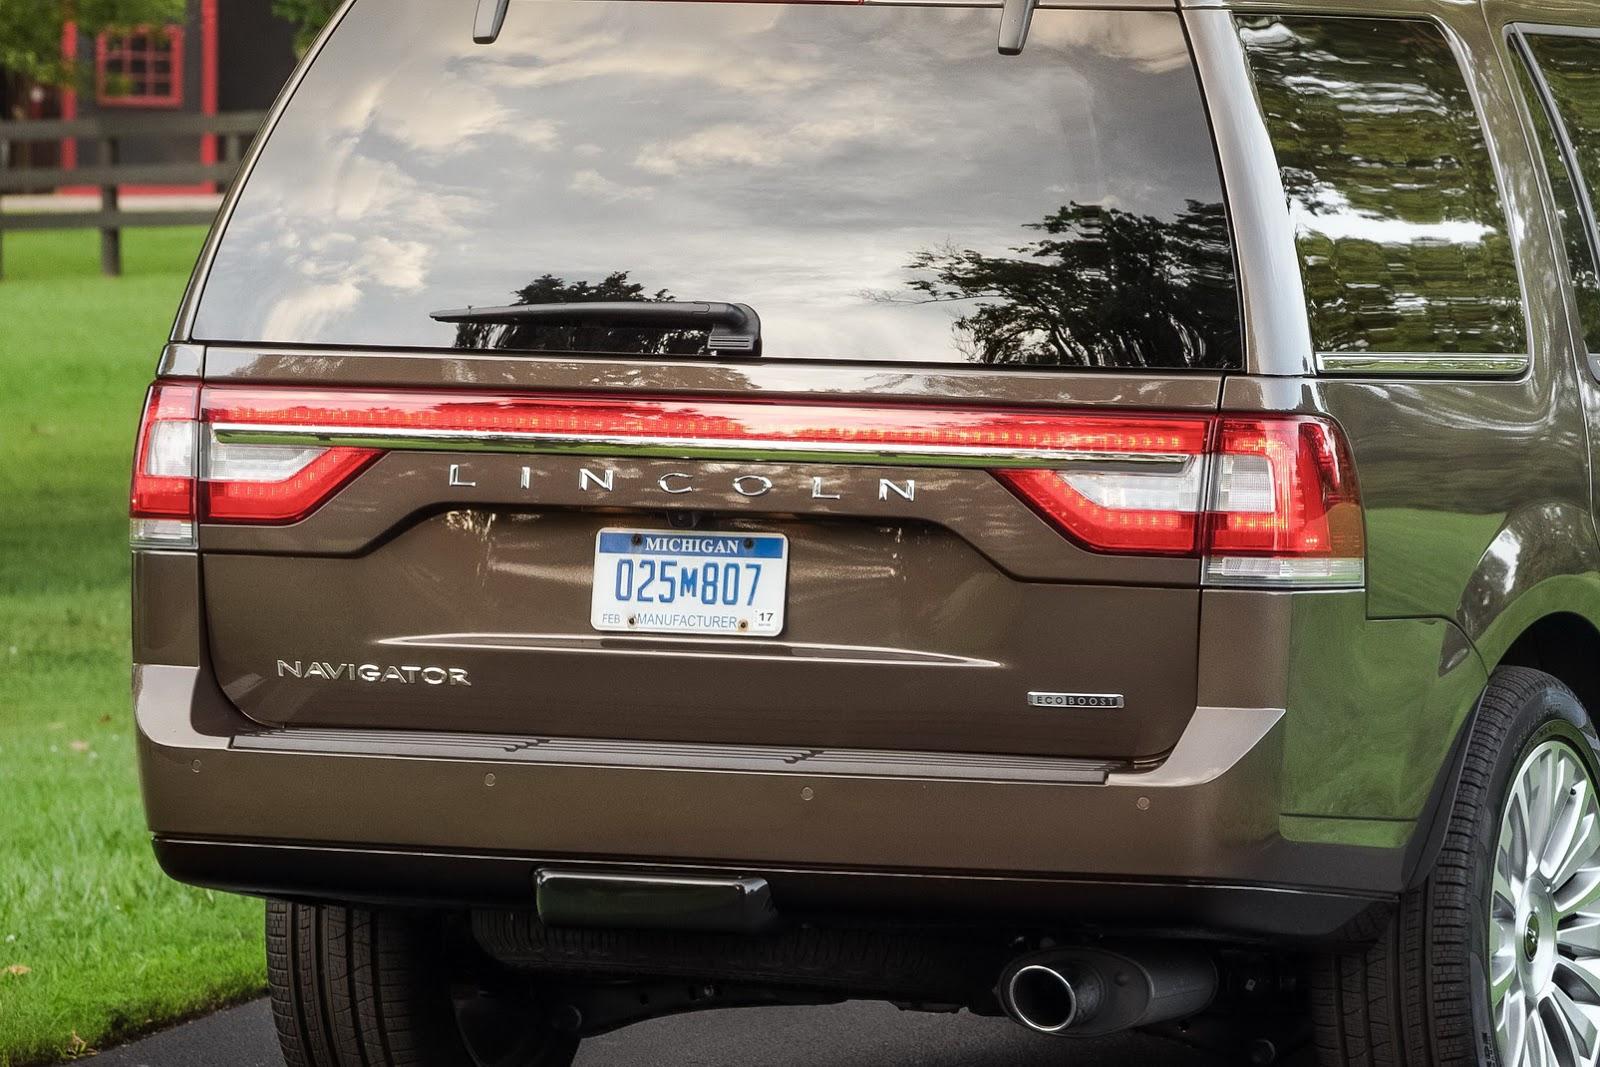 Joe Cooper Ford Used Cars >> 2015 Cadillac Escalade Mpg.html | Autos Post